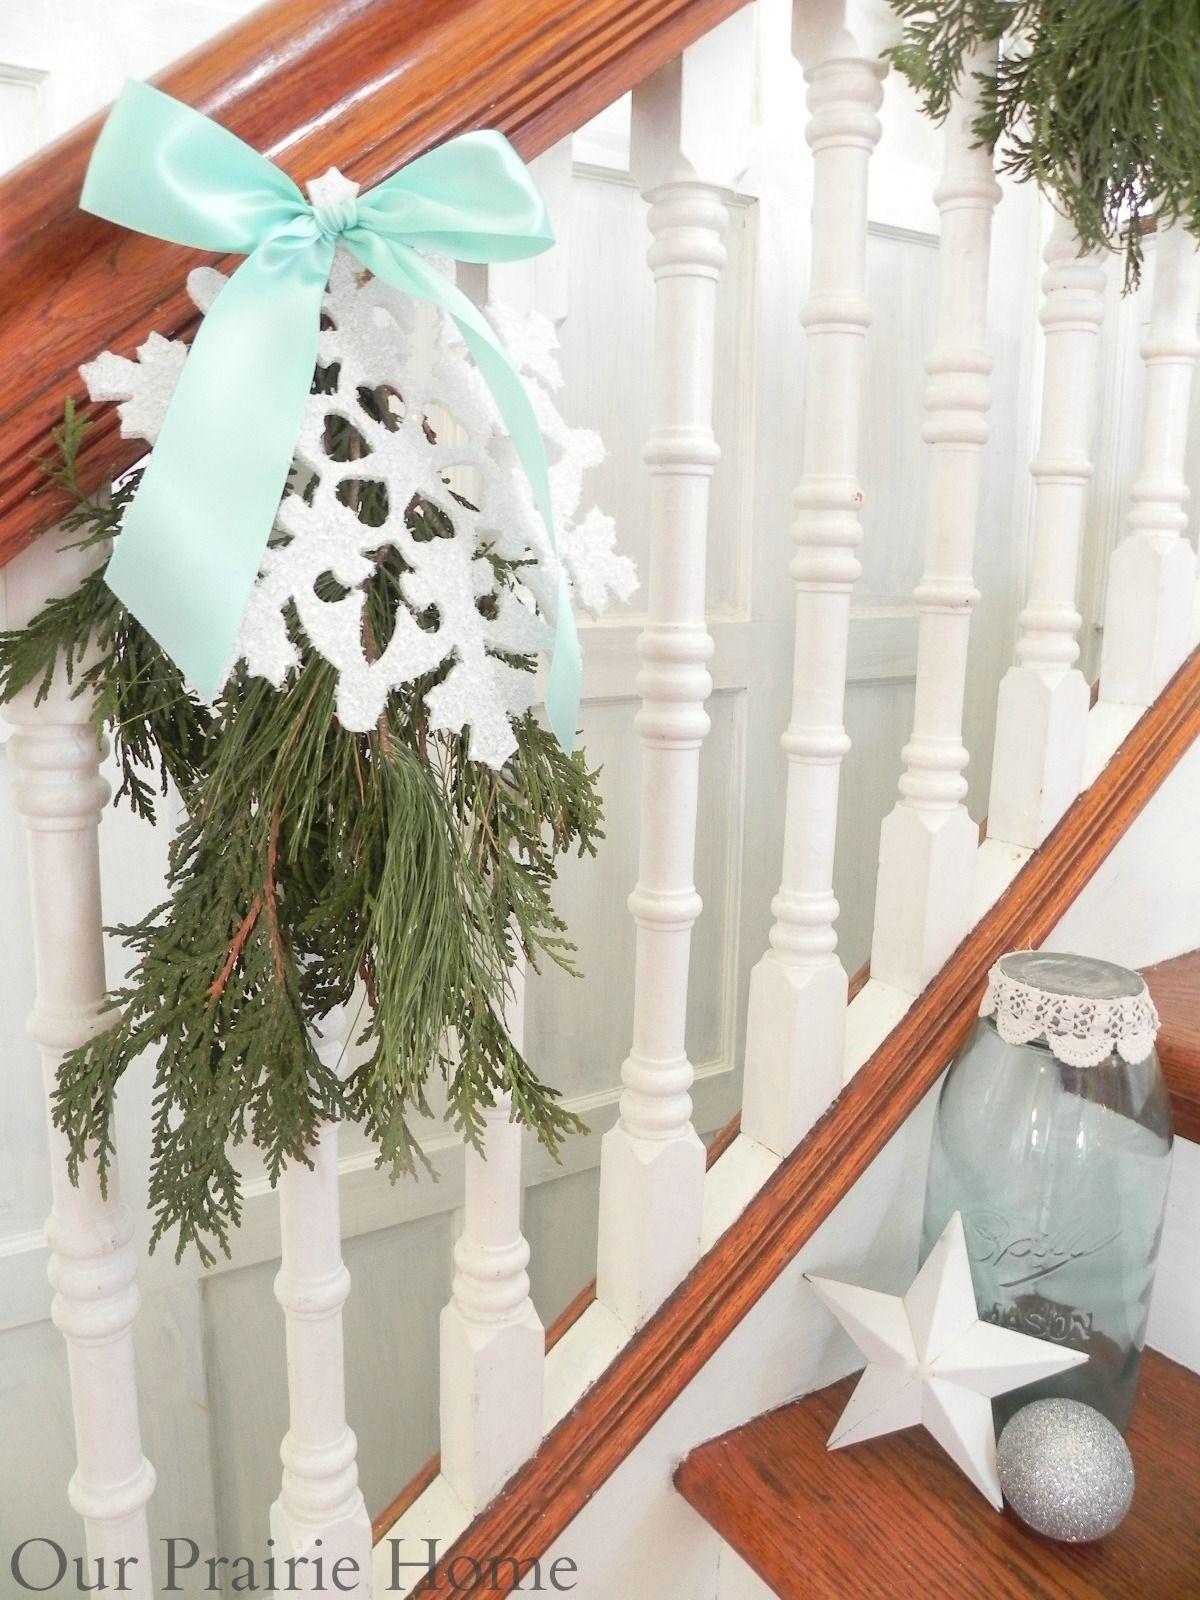 Our Prairie Home: Seasonal Decor | Seasonal decorations | Pinterest ...